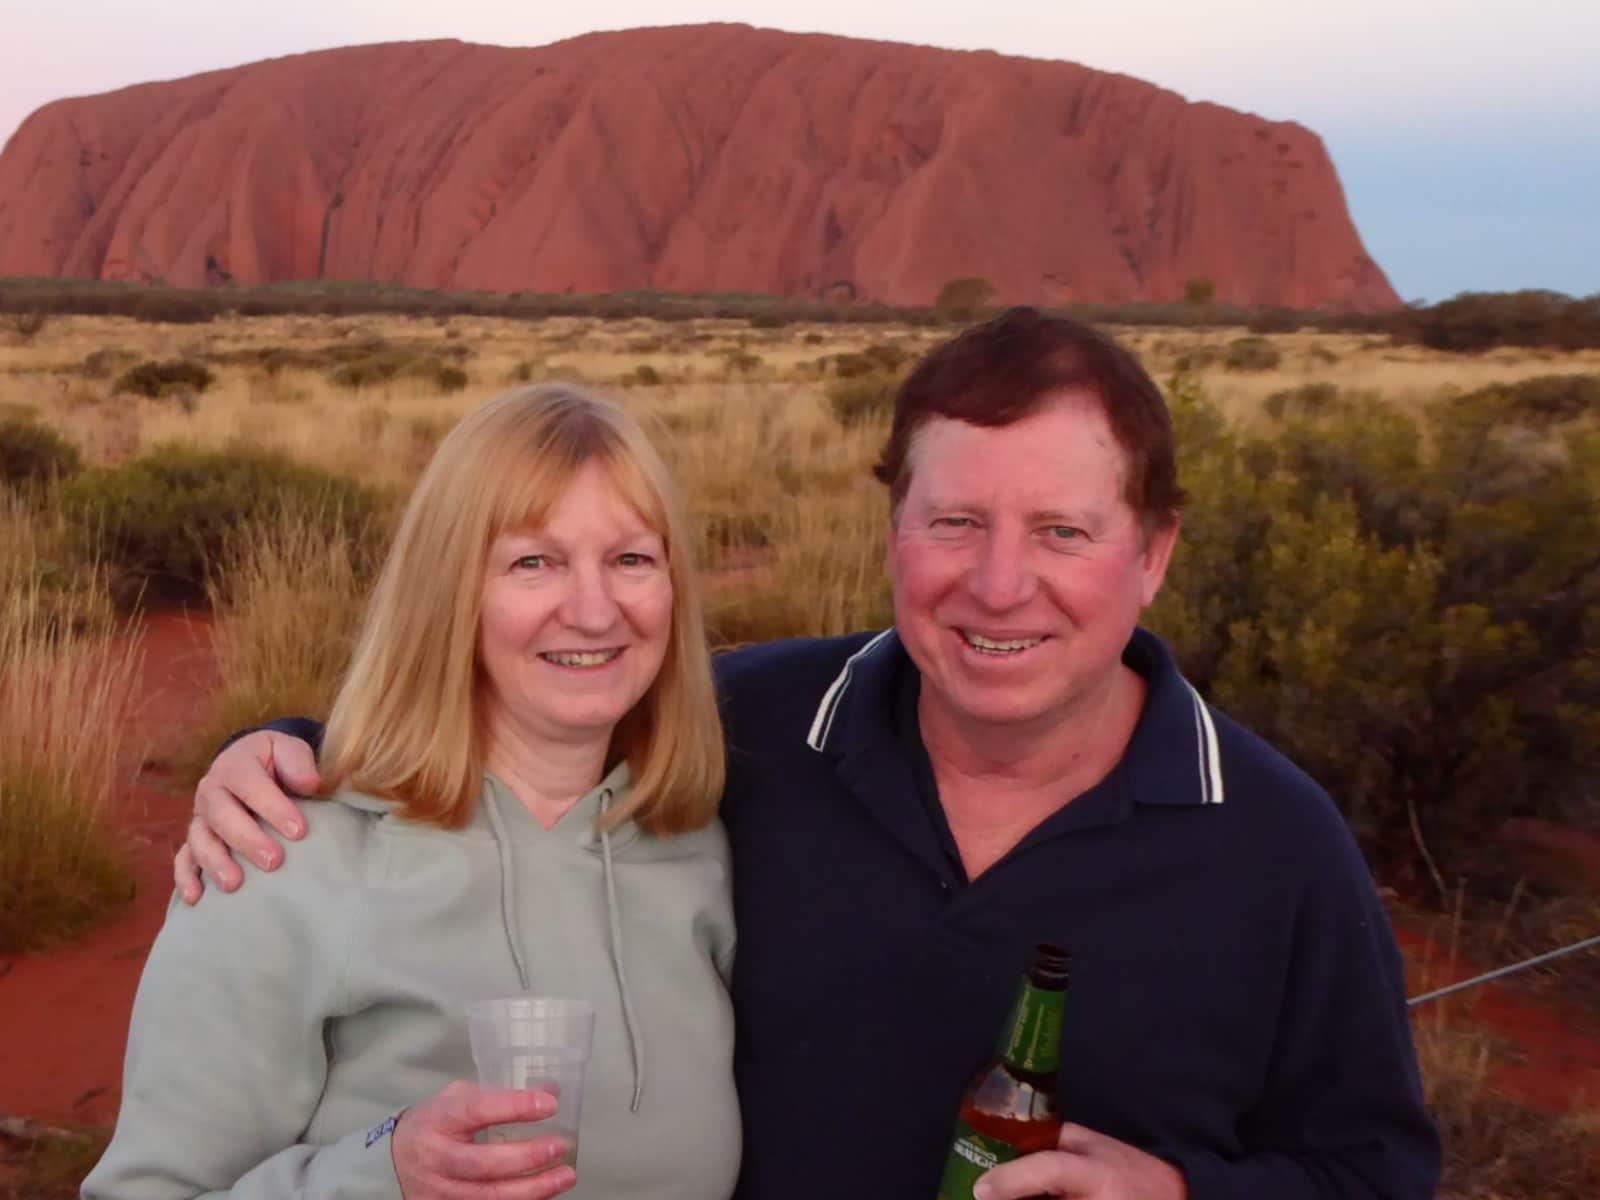 Lorraine from Caboolture, Queensland, Australia